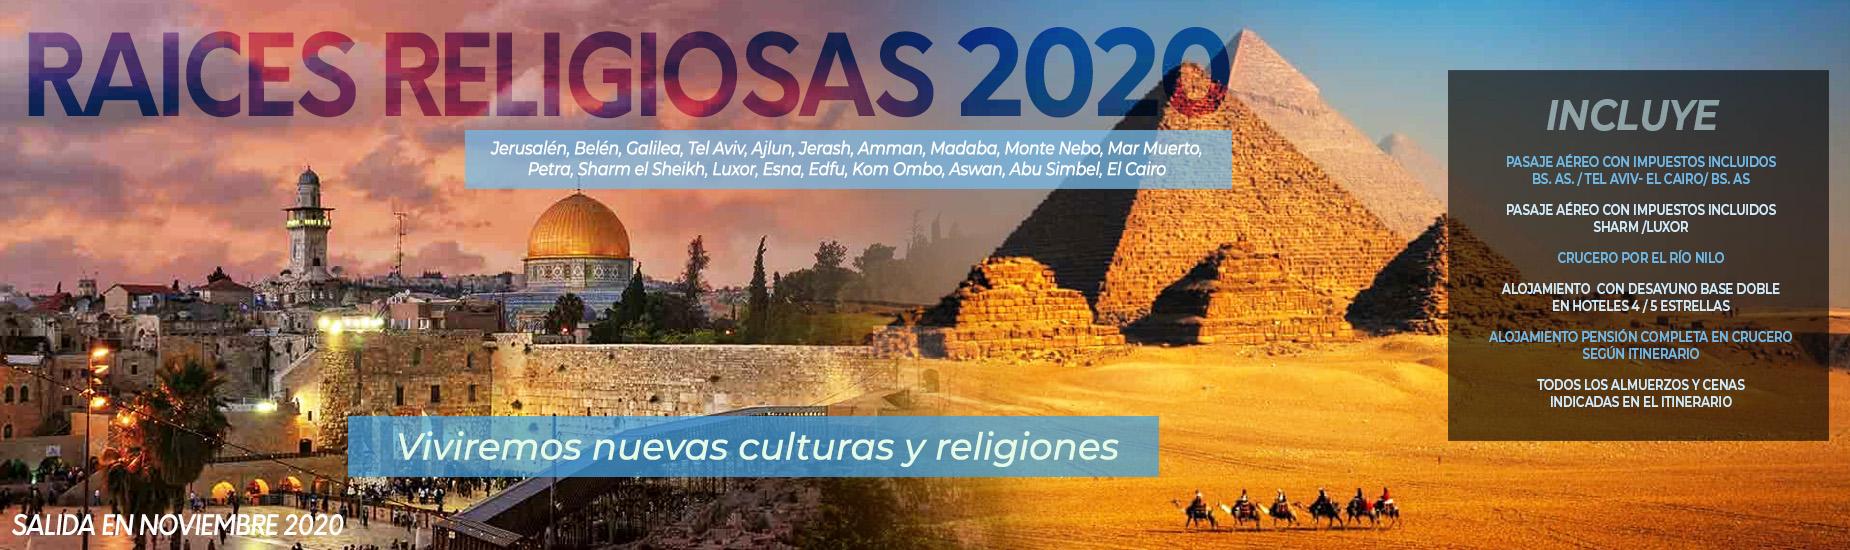 Raíces Religiosas 2020